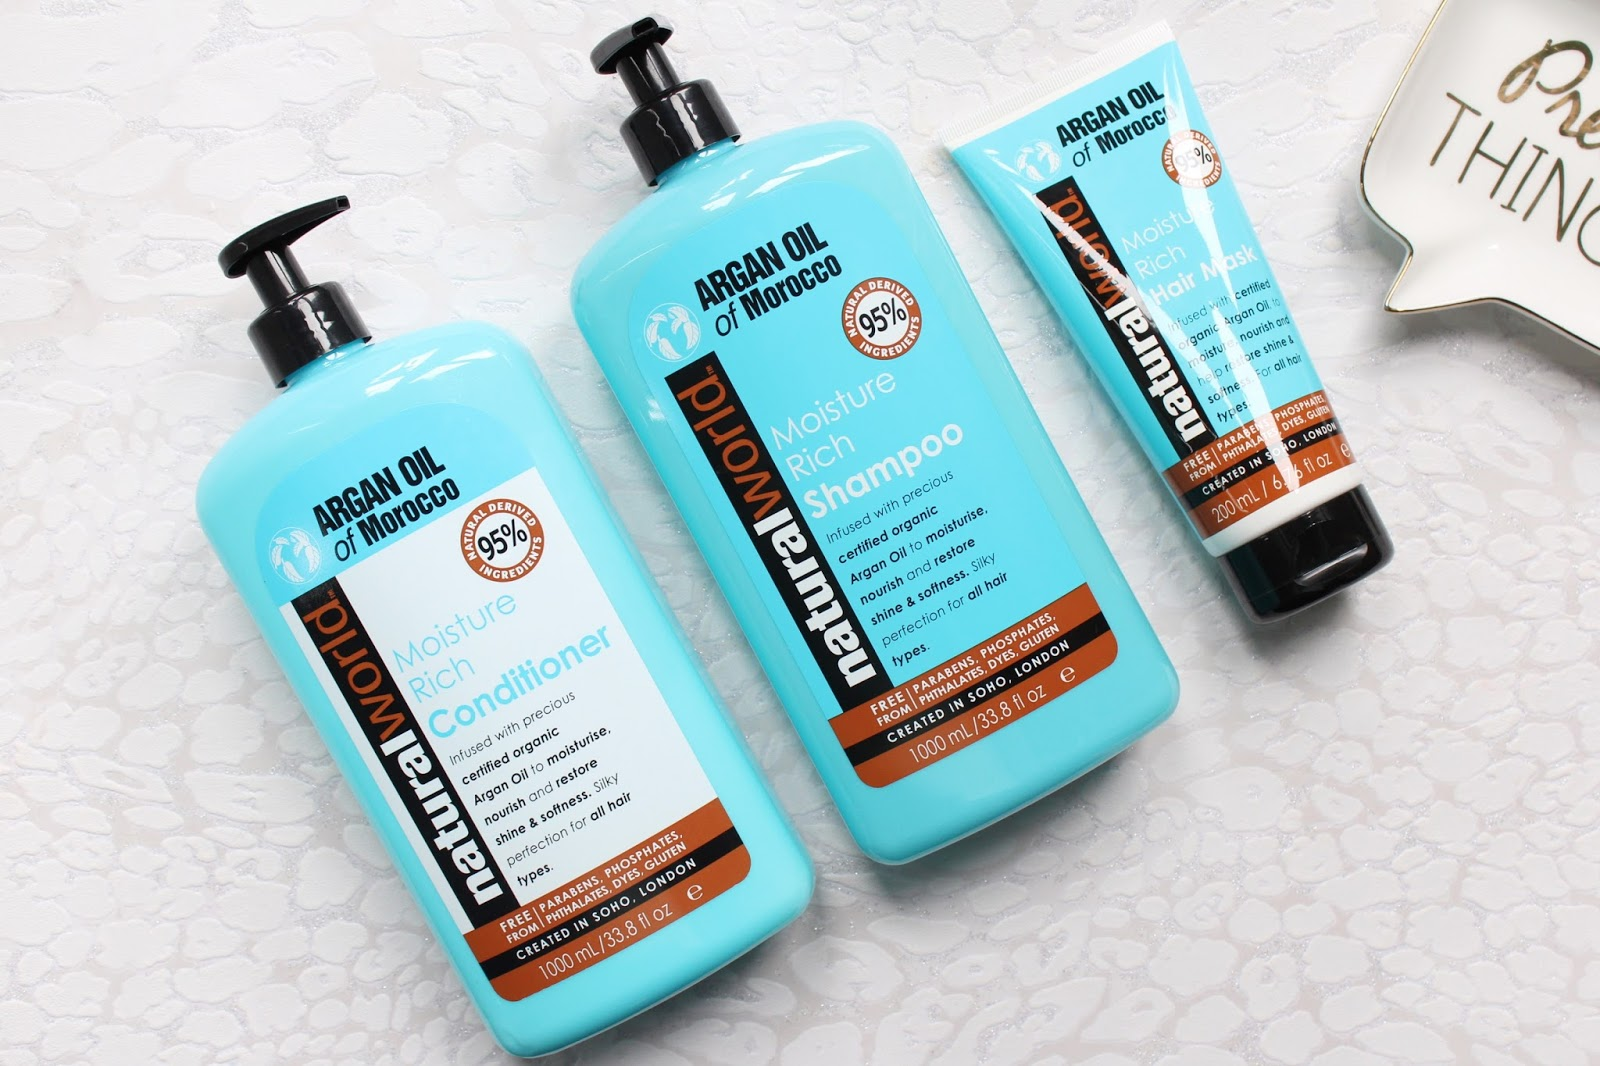 Argan Oil of Morocco Hair Care